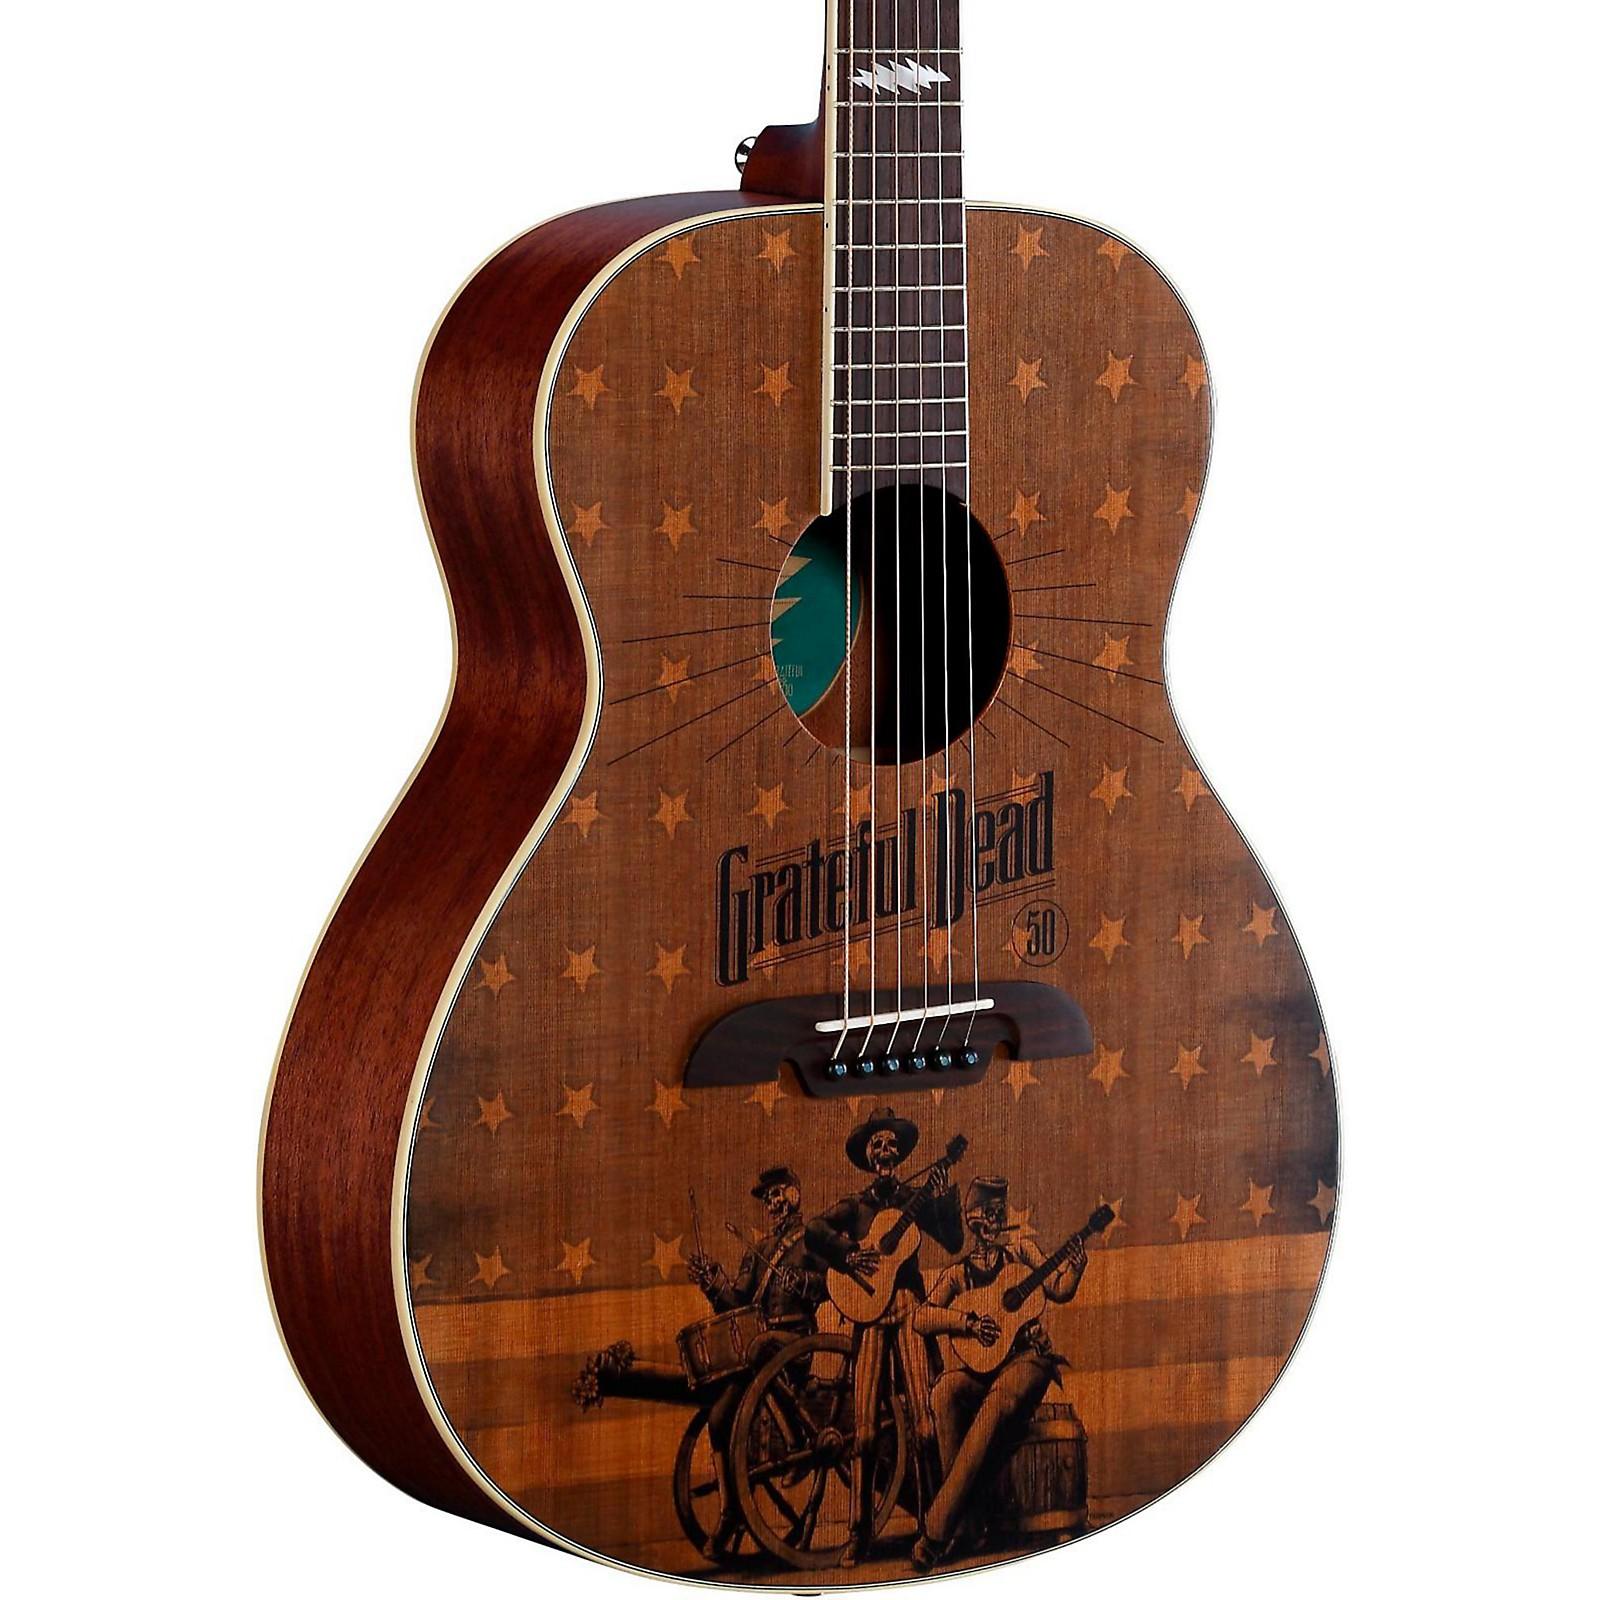 Alvarez Grateful Dead 50th Anniversary Acoustic Guitar